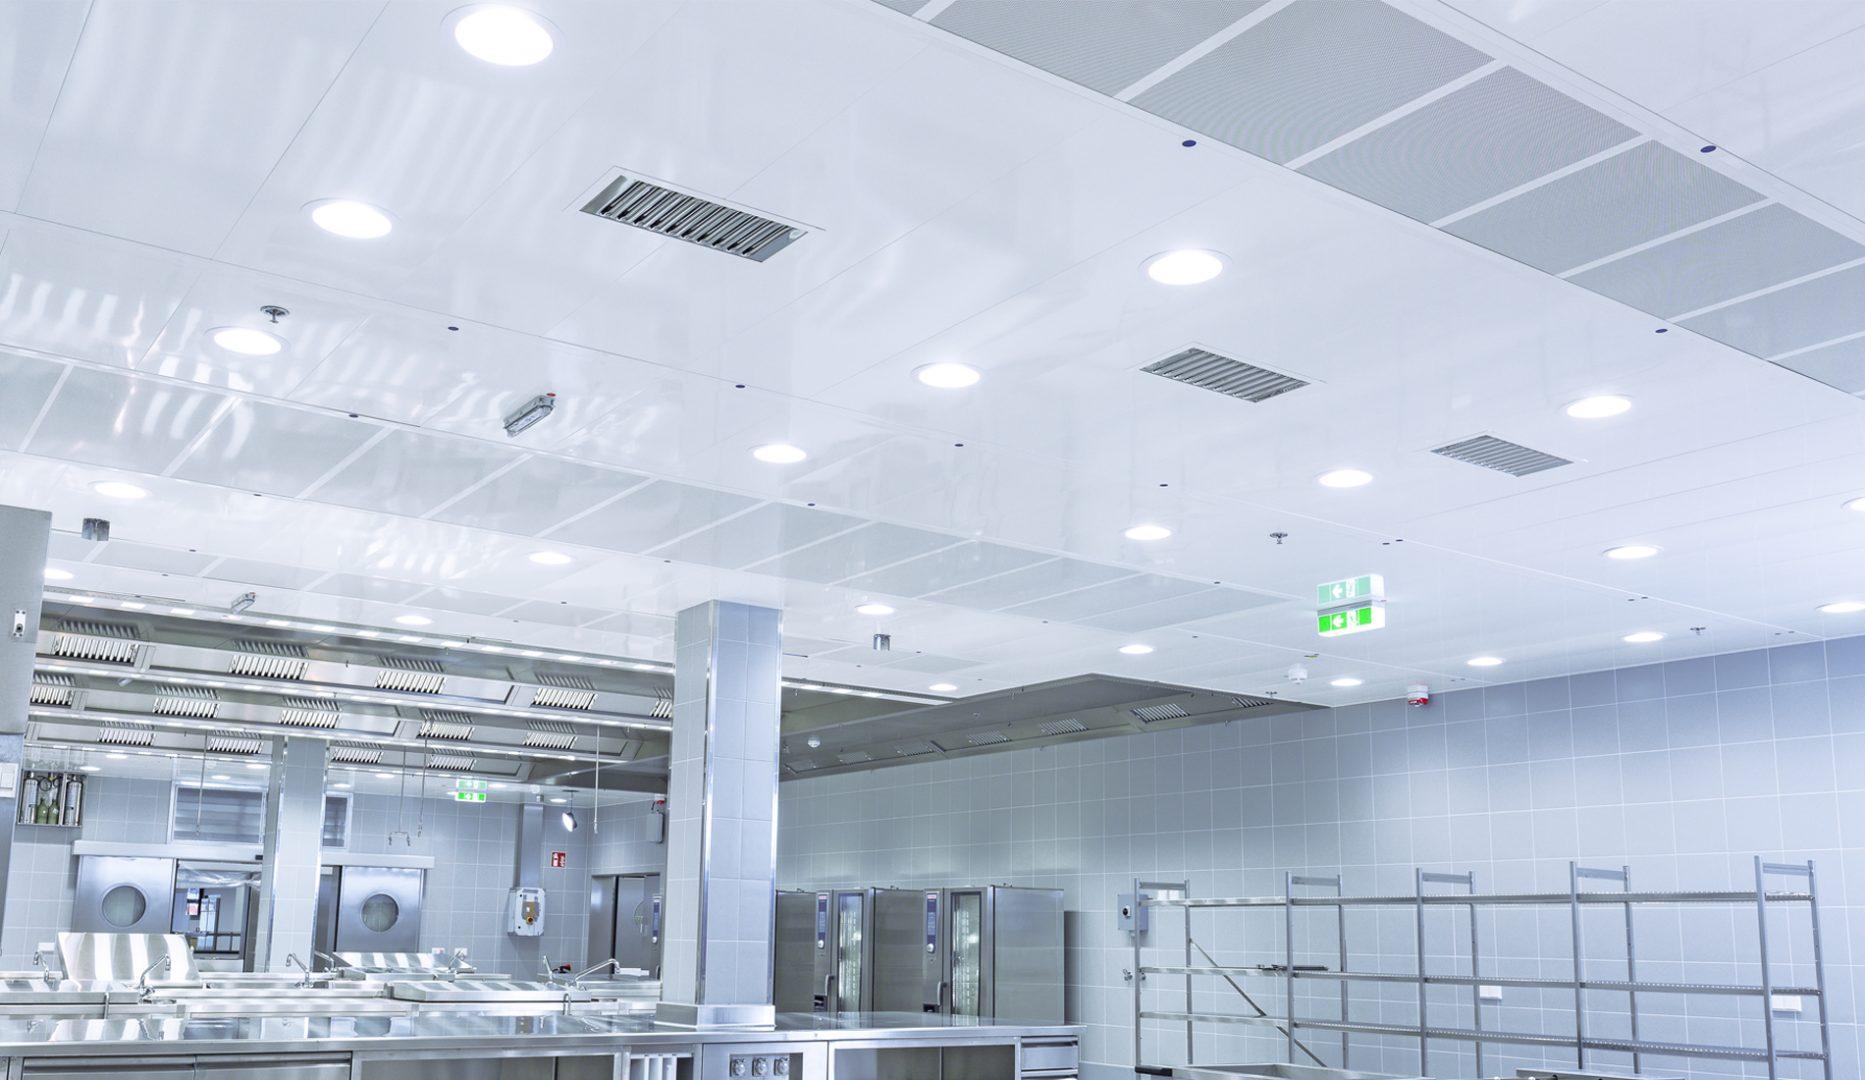 LFU kitchen laminar flow diffuser